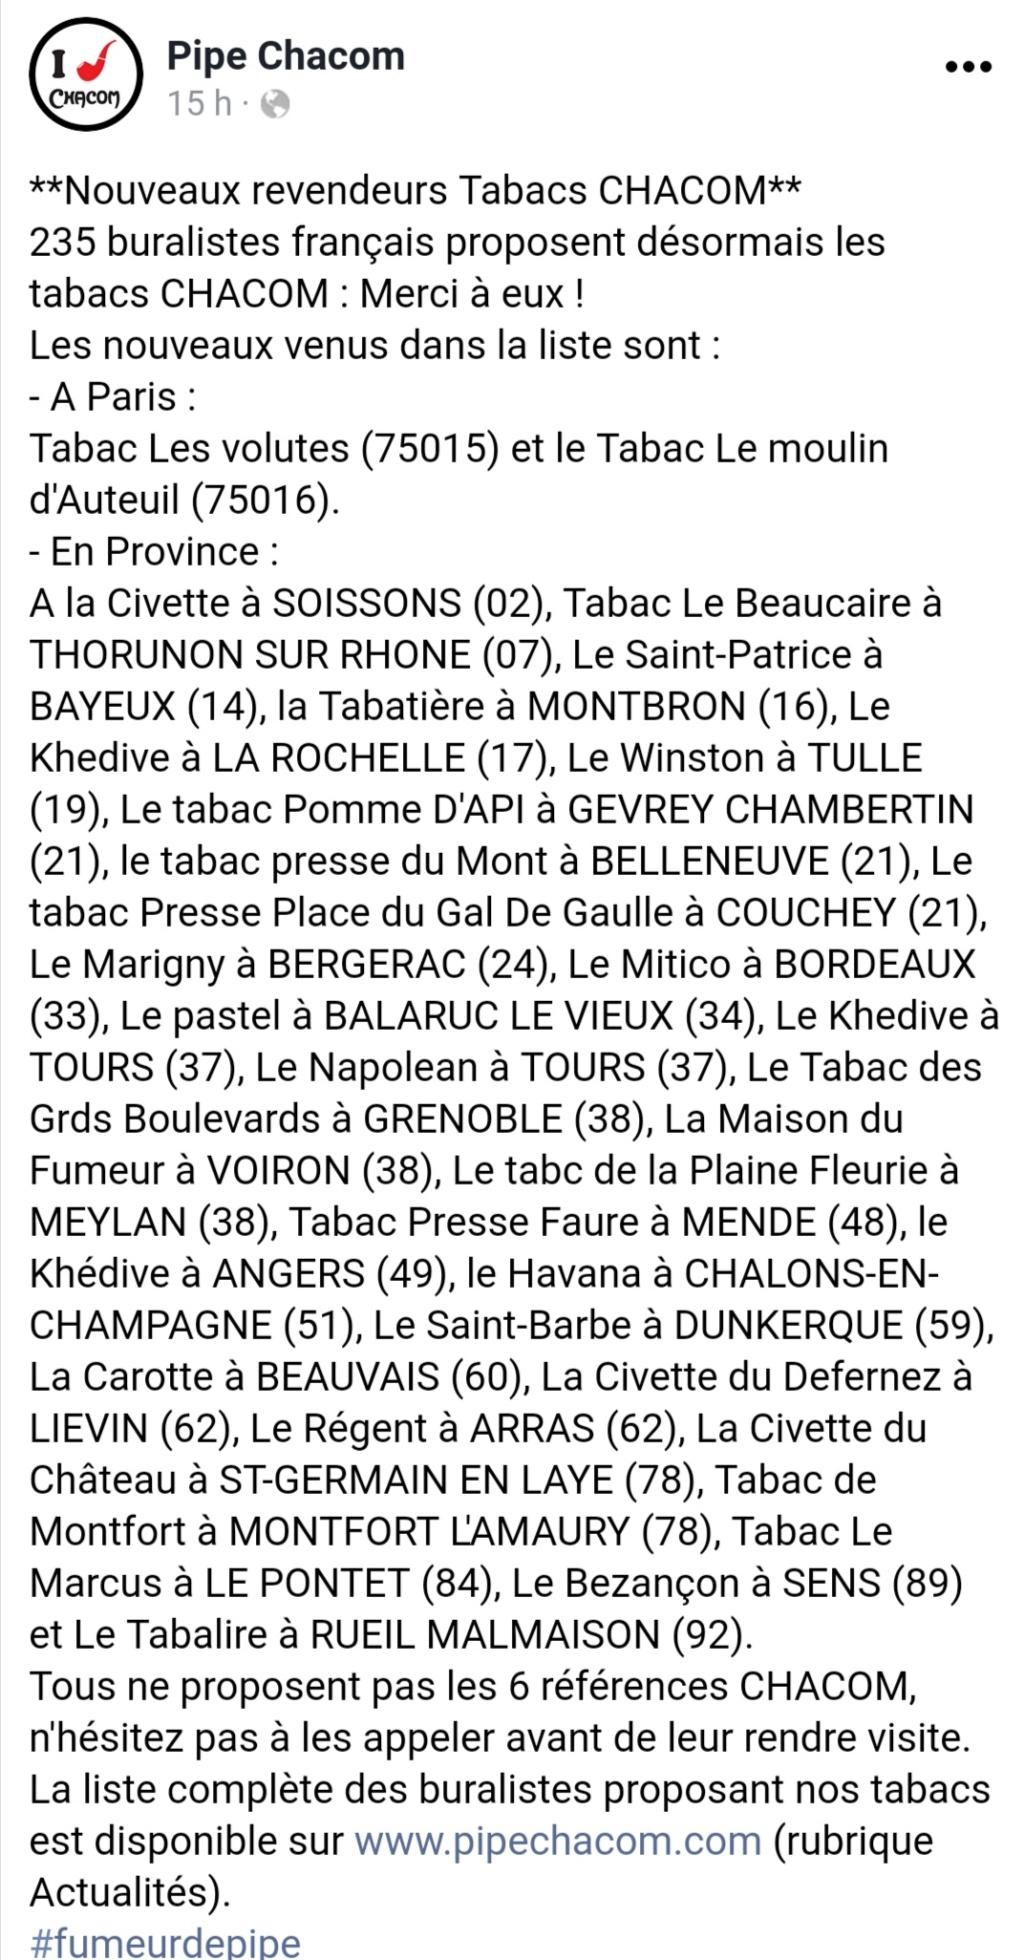 Les tabacs CHACOM arrivent... En France !  - Page 7 Screen24